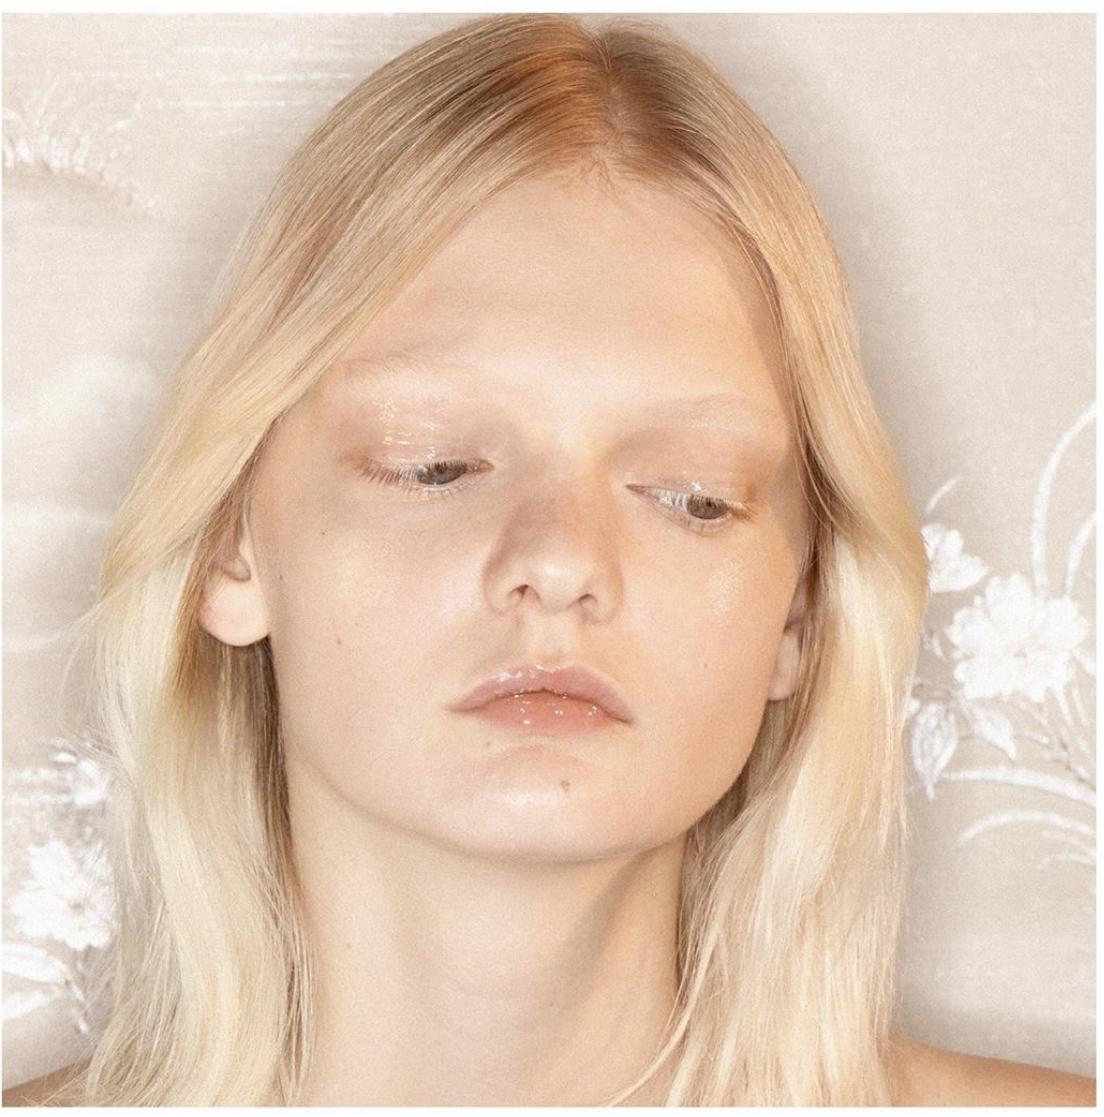 Gucci Beauty Eclat De Beaute Effet Lumiere Gel Face Gloss